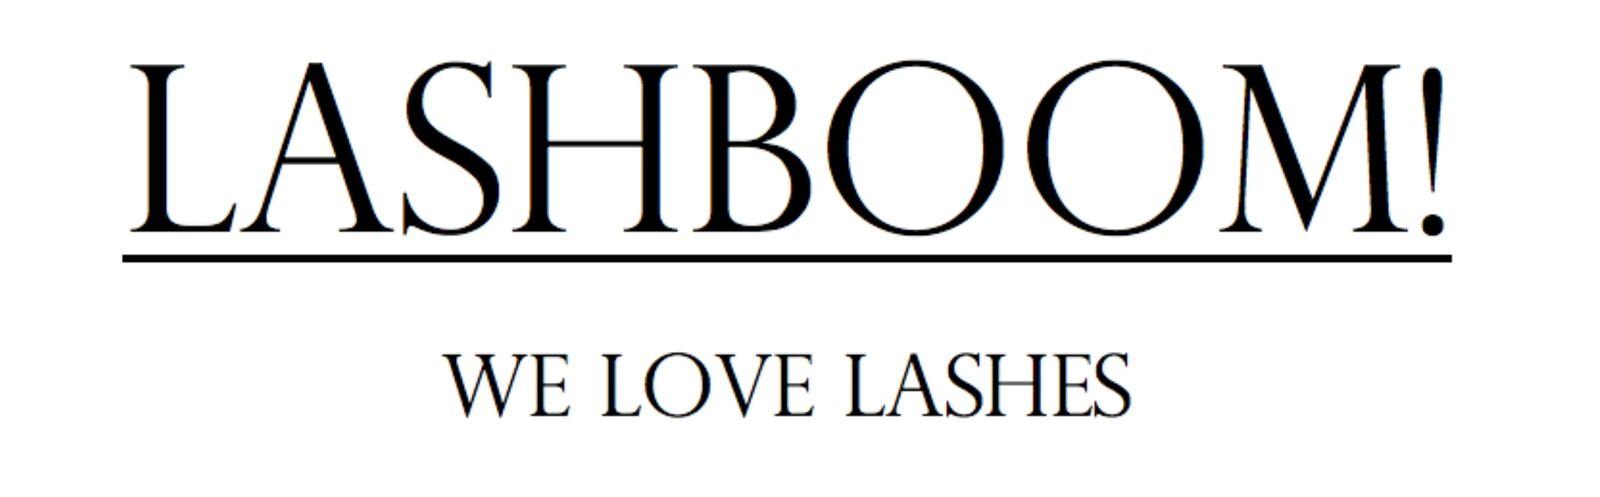 LASHBOOM! - WE LOVE LASHES -